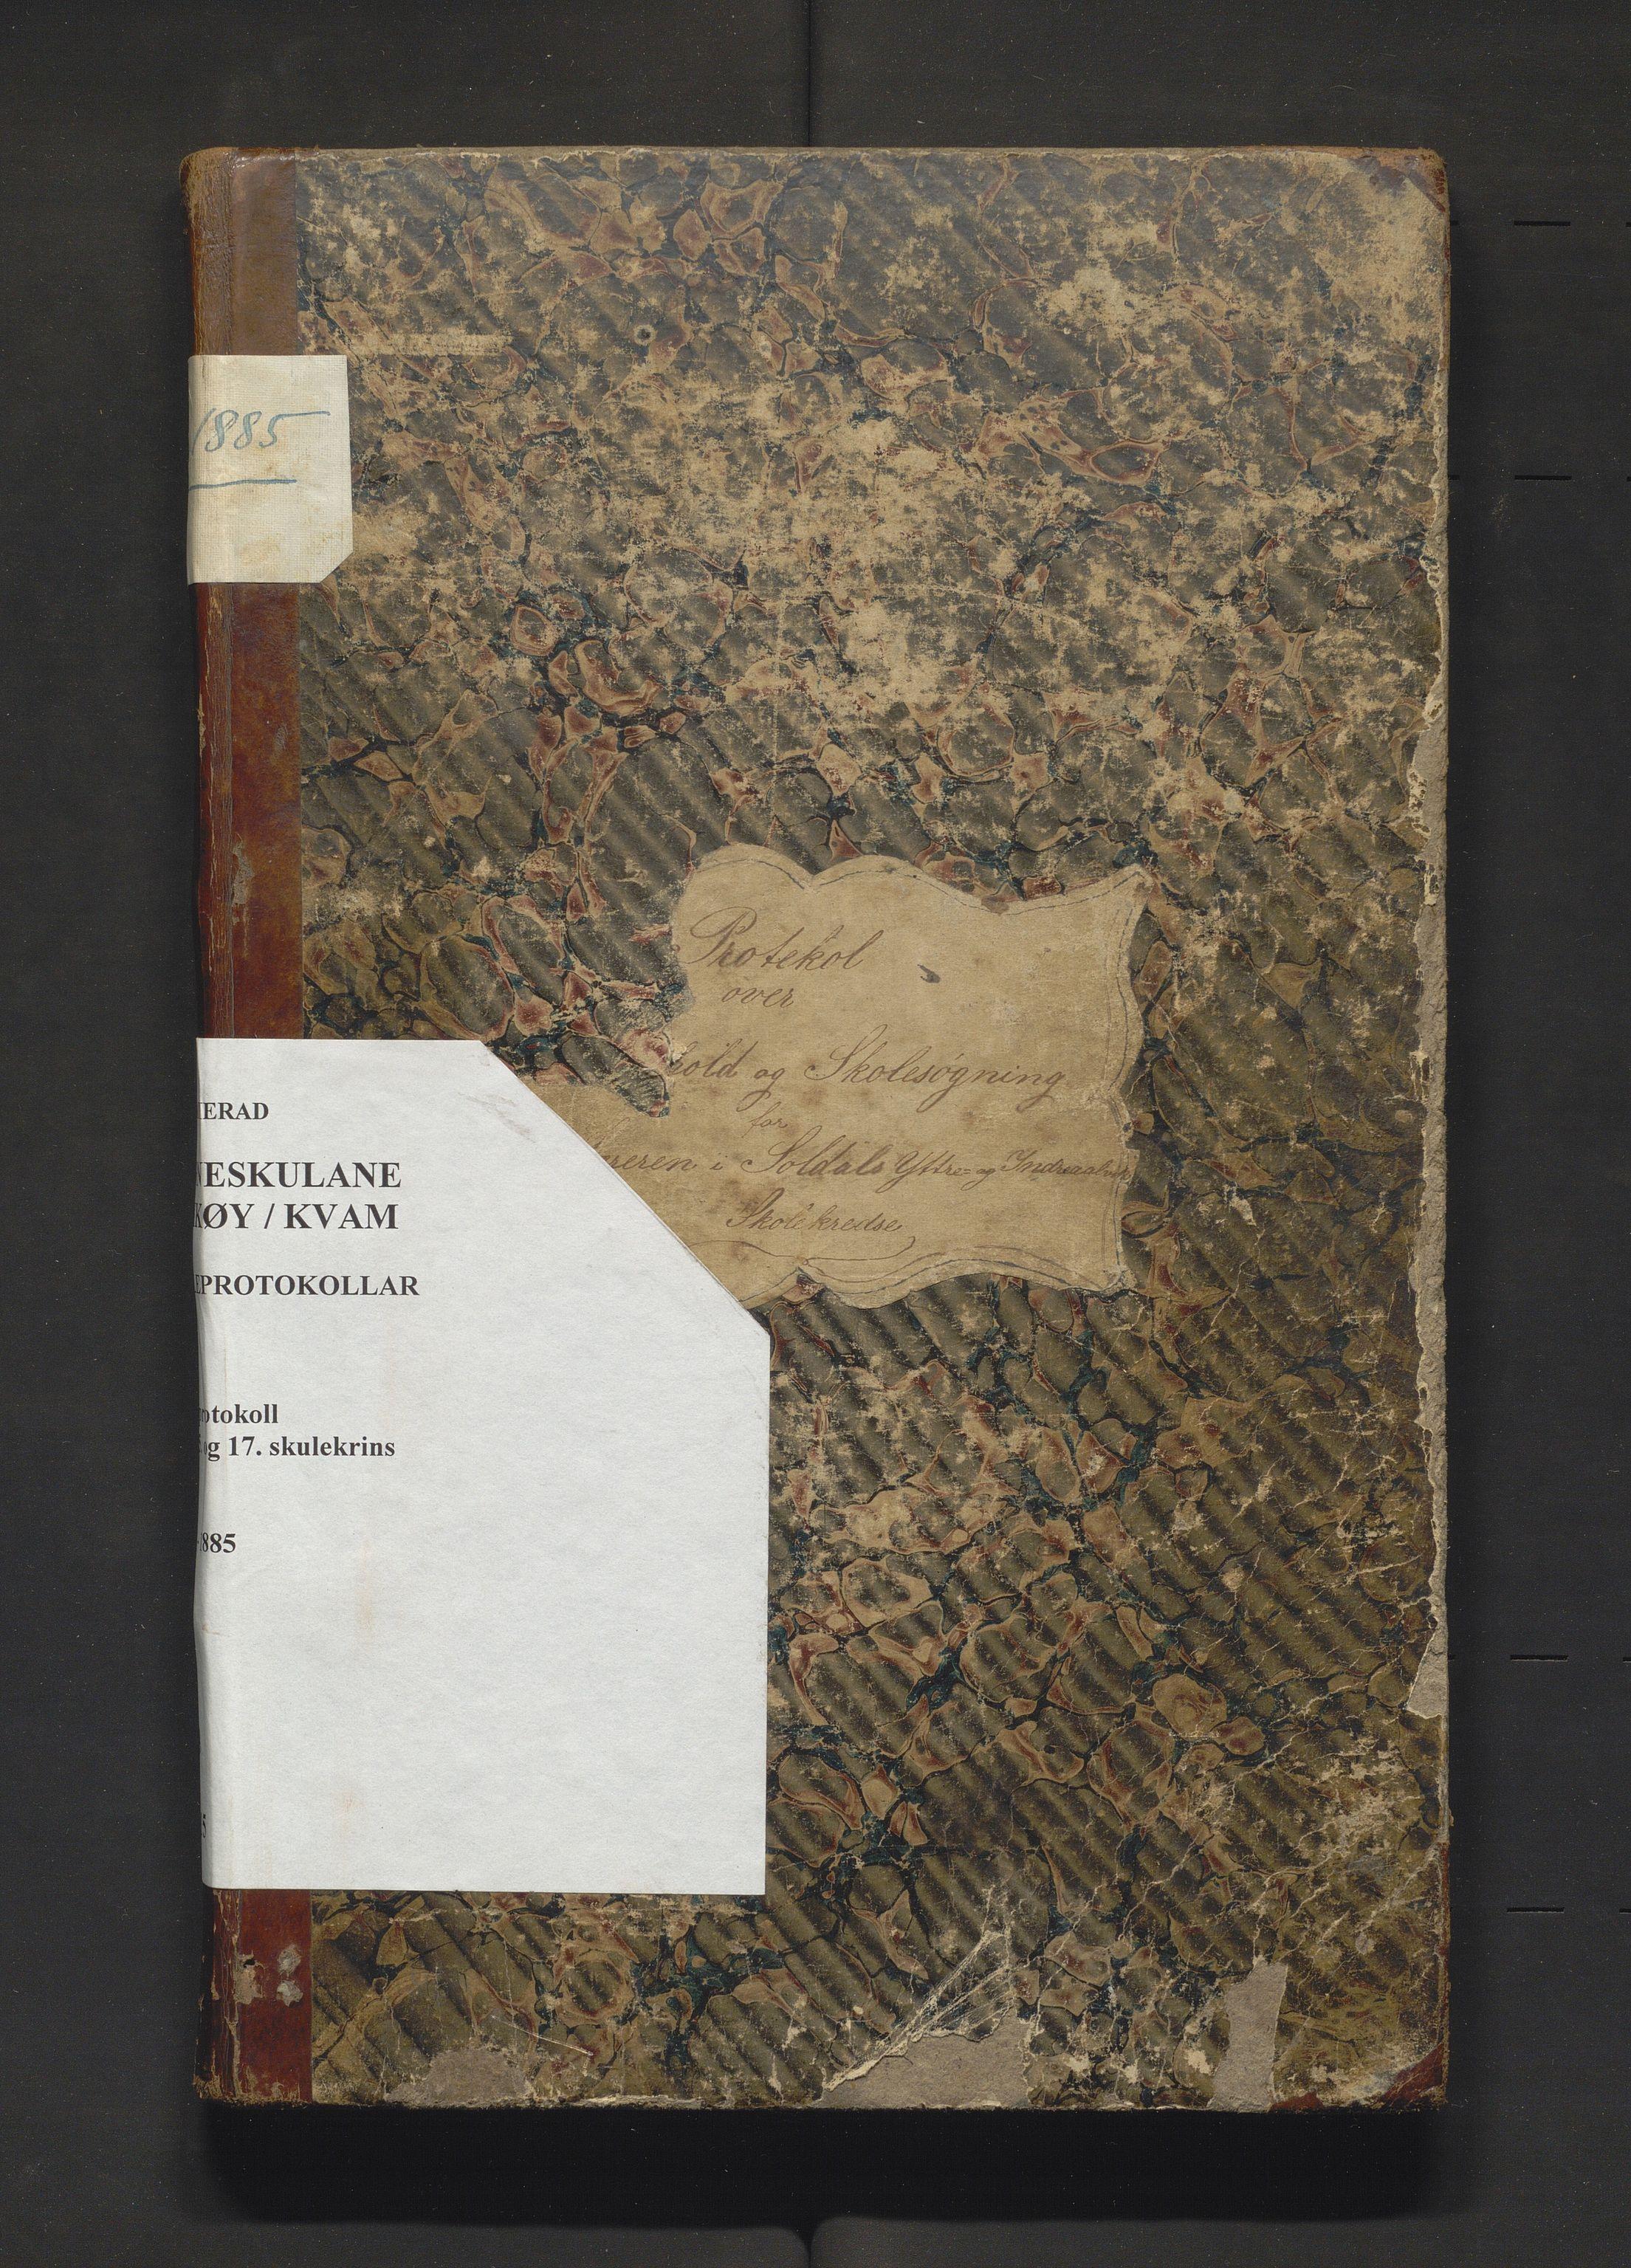 IKAH, Kvam herad. Barneskulane, F/Fa/L0015: Skuleprotokoll for læraren i 7. skuledistrikt i Vikøy prestegjeld, 14., 15. og 17 skulekrins m/ inventarliste, 1861-1885